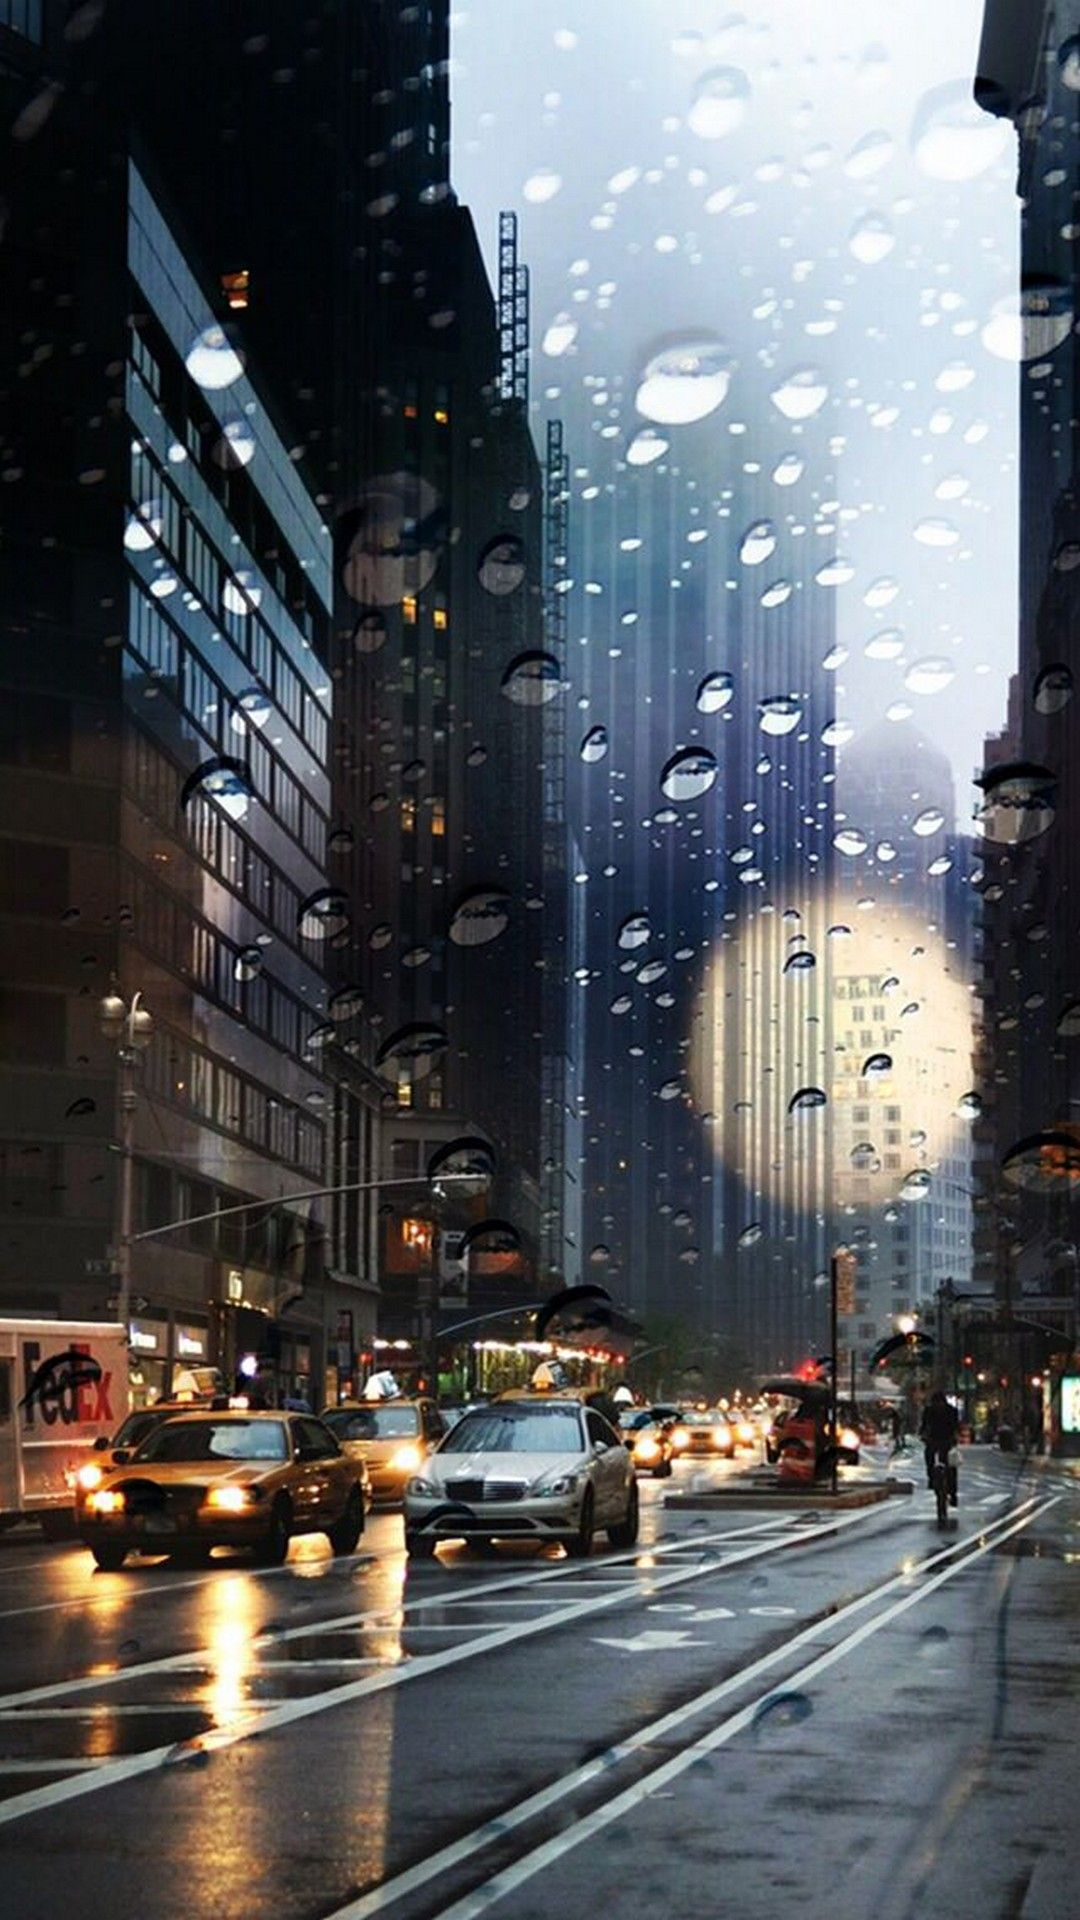 City Rain iPhone wallpaper | iPhoneWallpapers | Iphone wallpaper rain, Iphone wallpaper travel ...